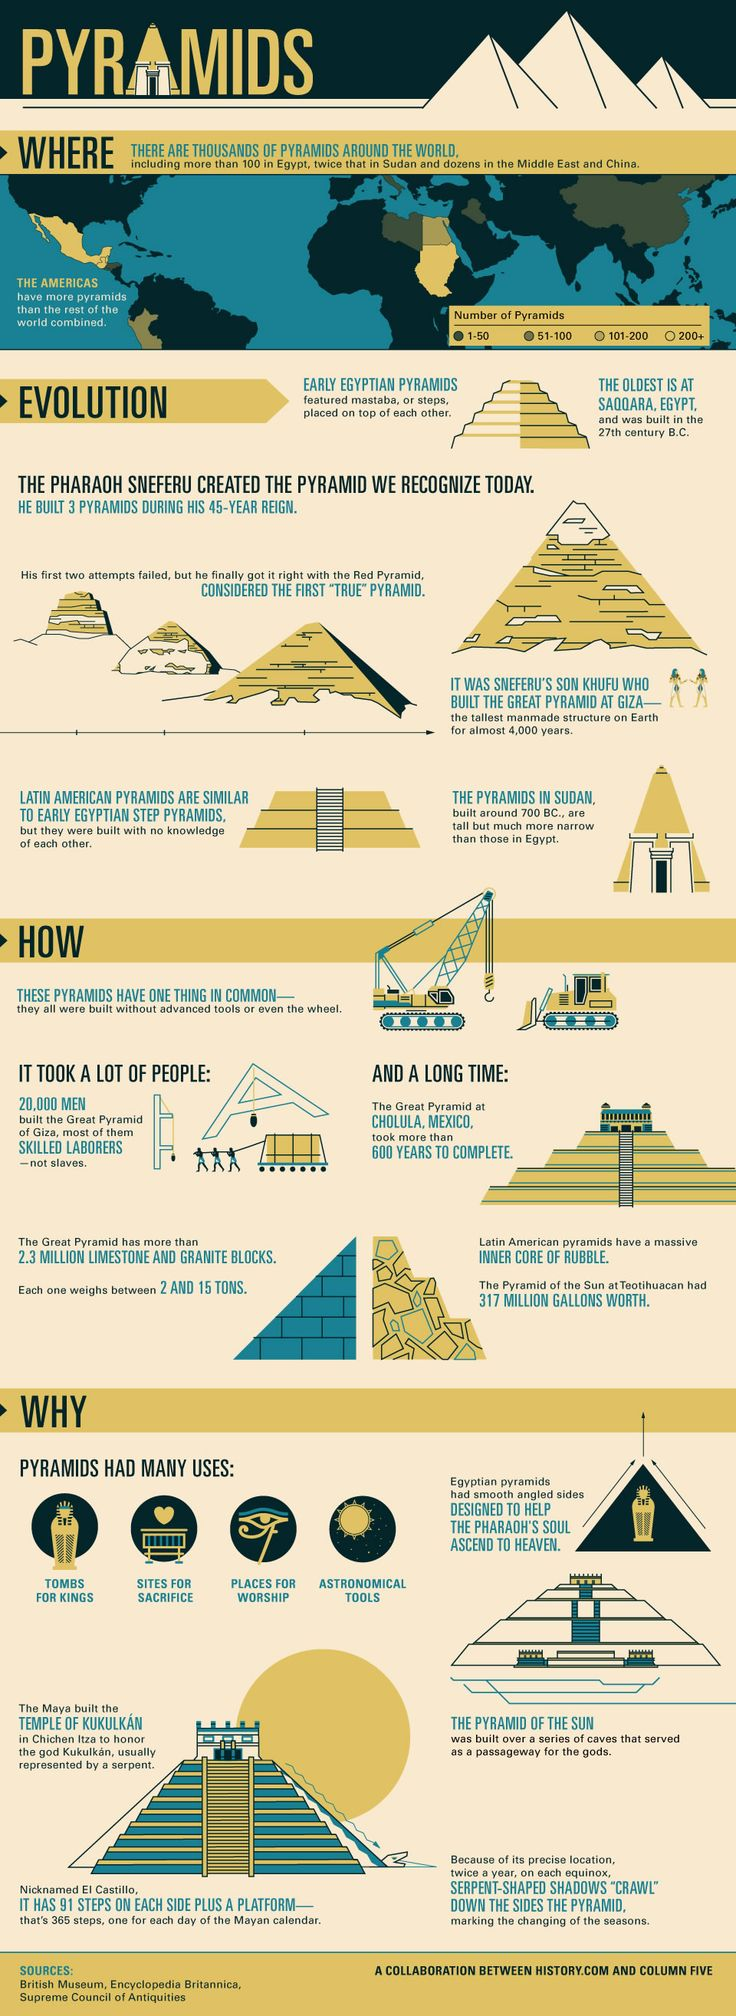 History of Pyramids #infographic #History #Pyramids